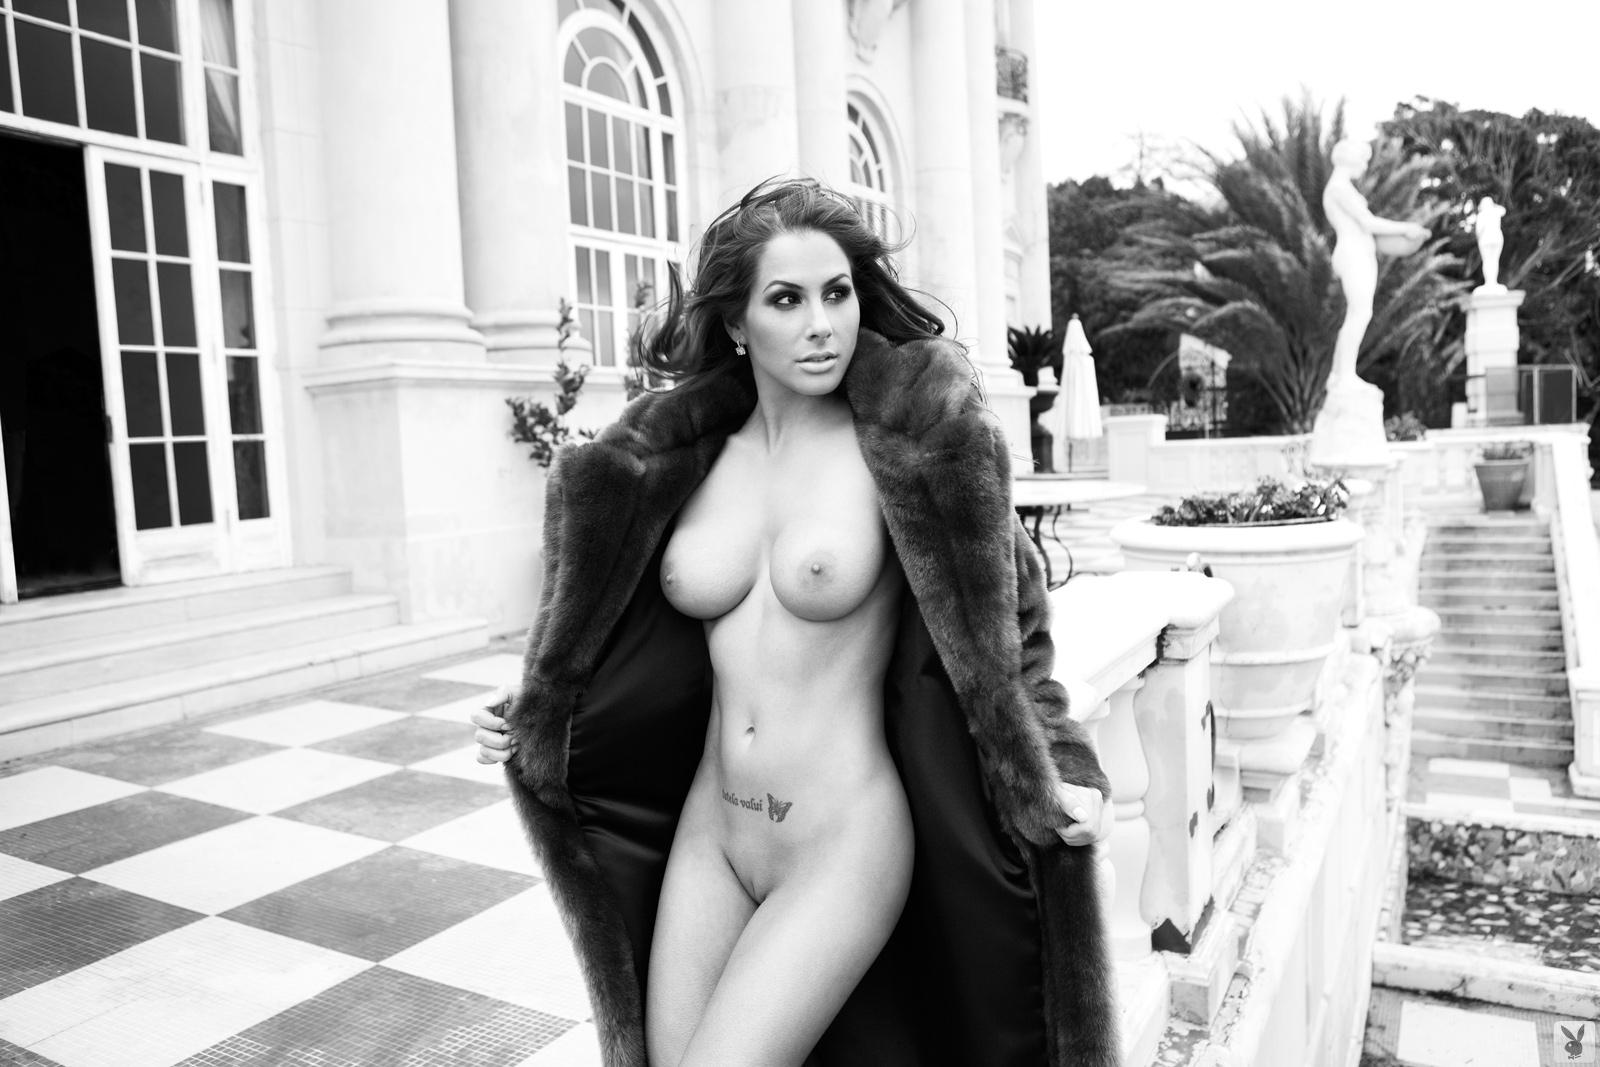 Nude pics of michelle mccool